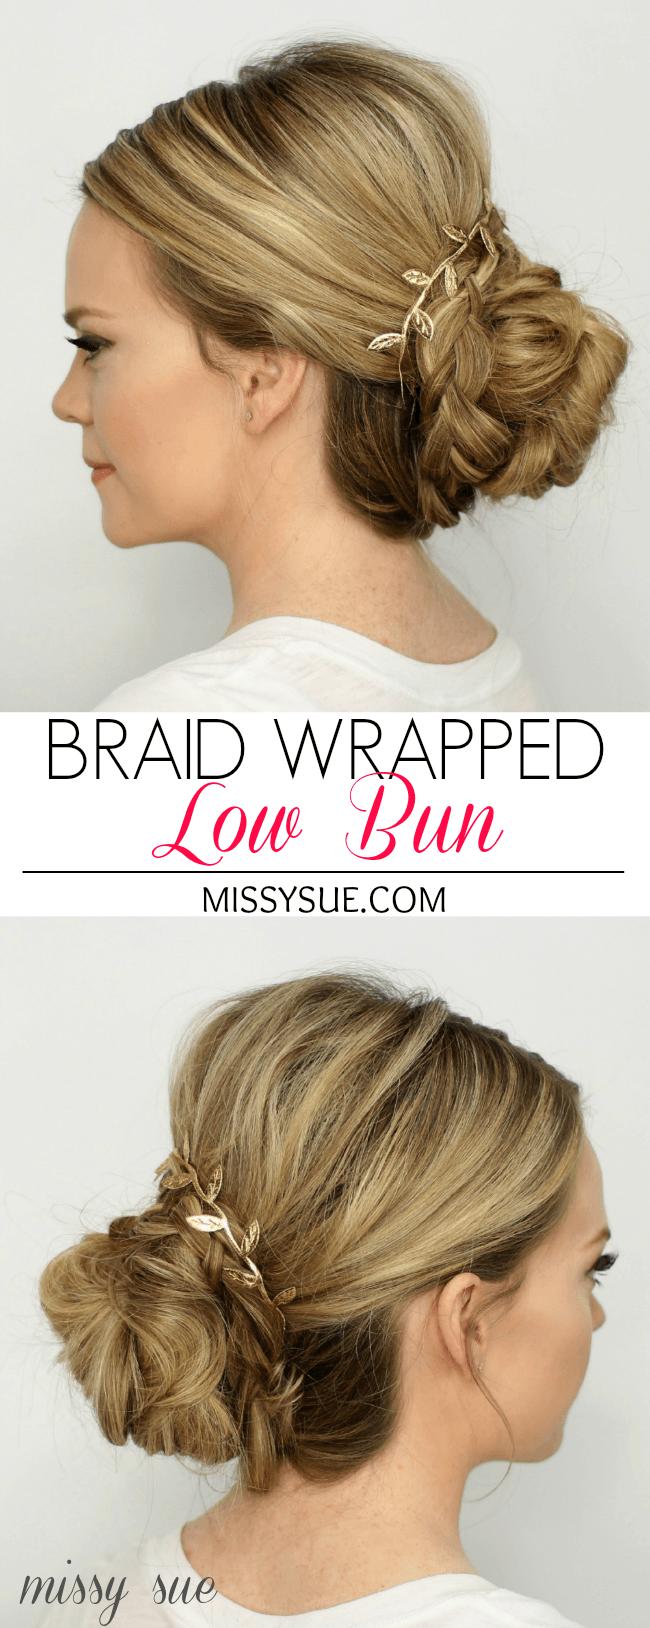 Braid Wrapped Low Bun   MissySue.com